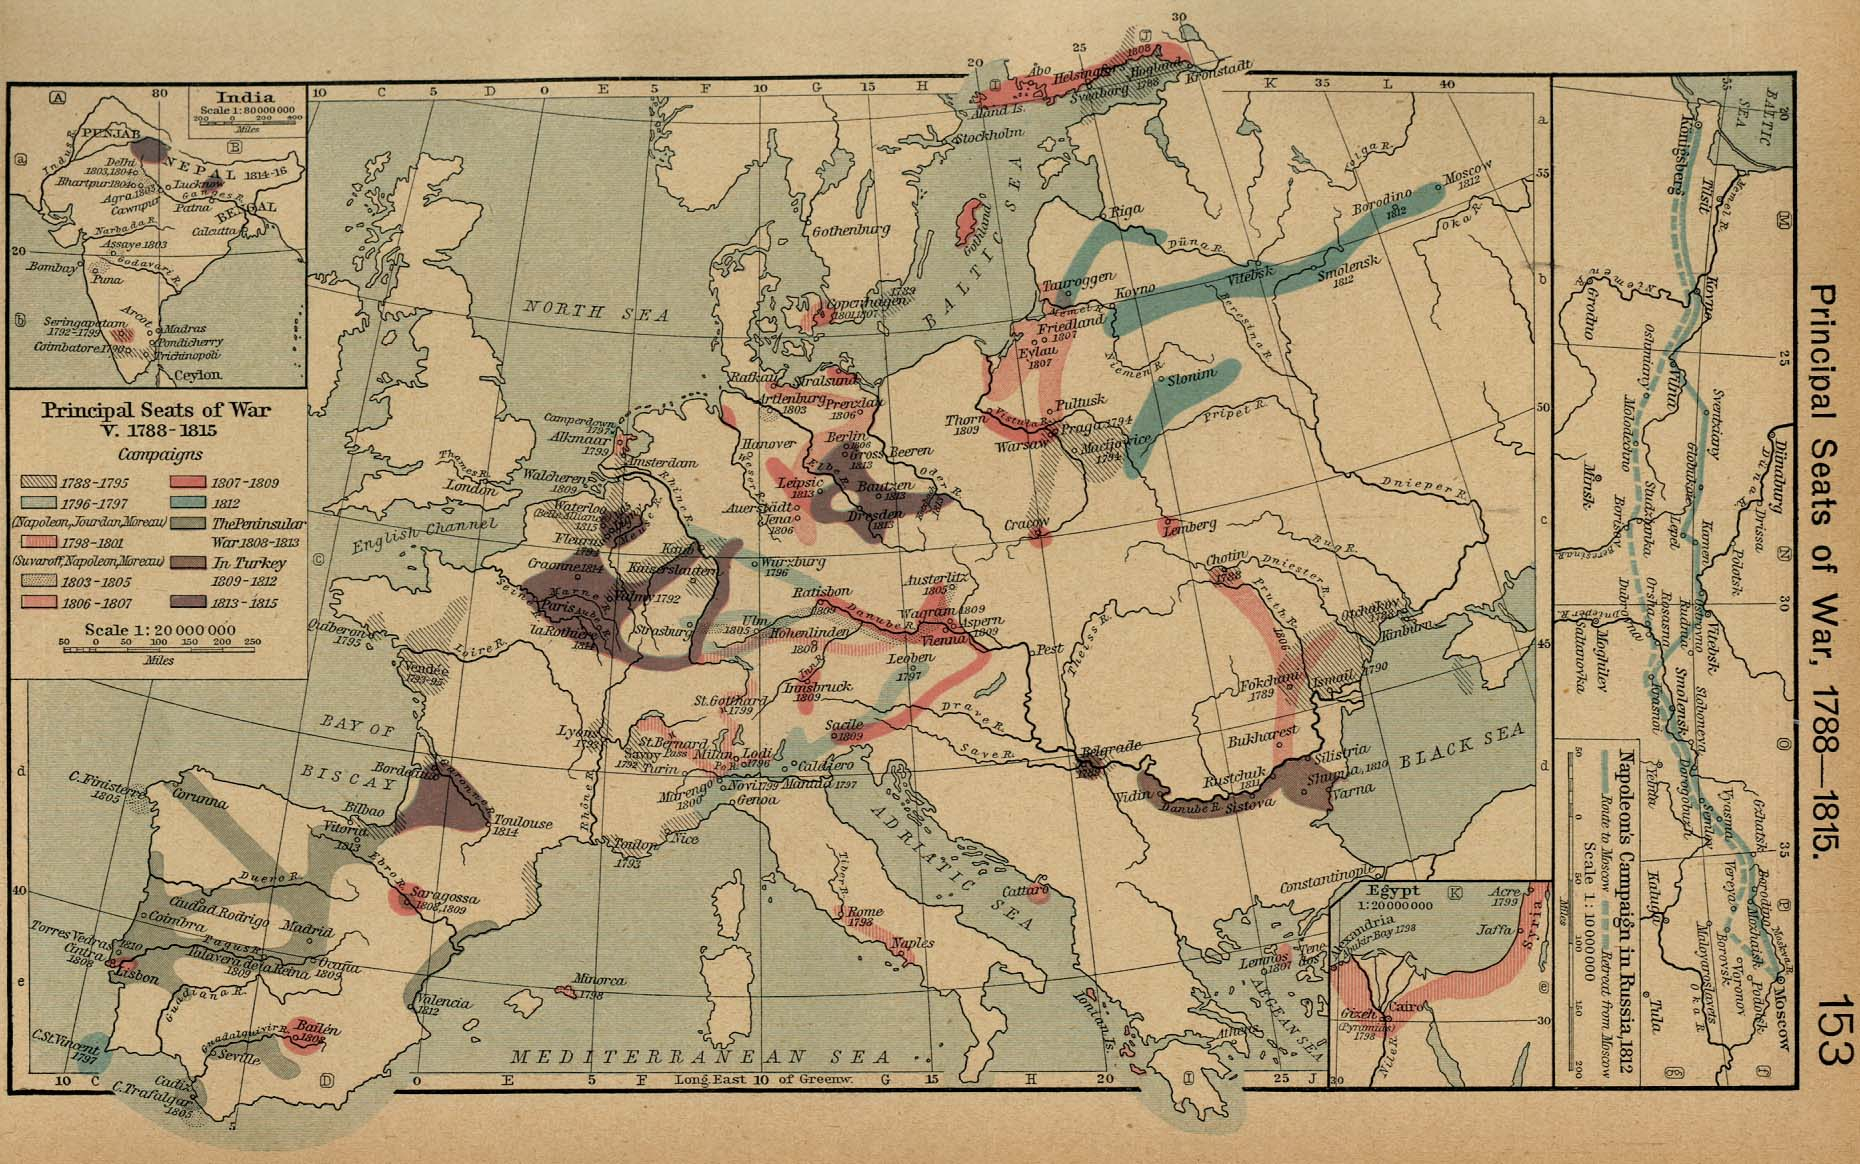 1788 in Russia